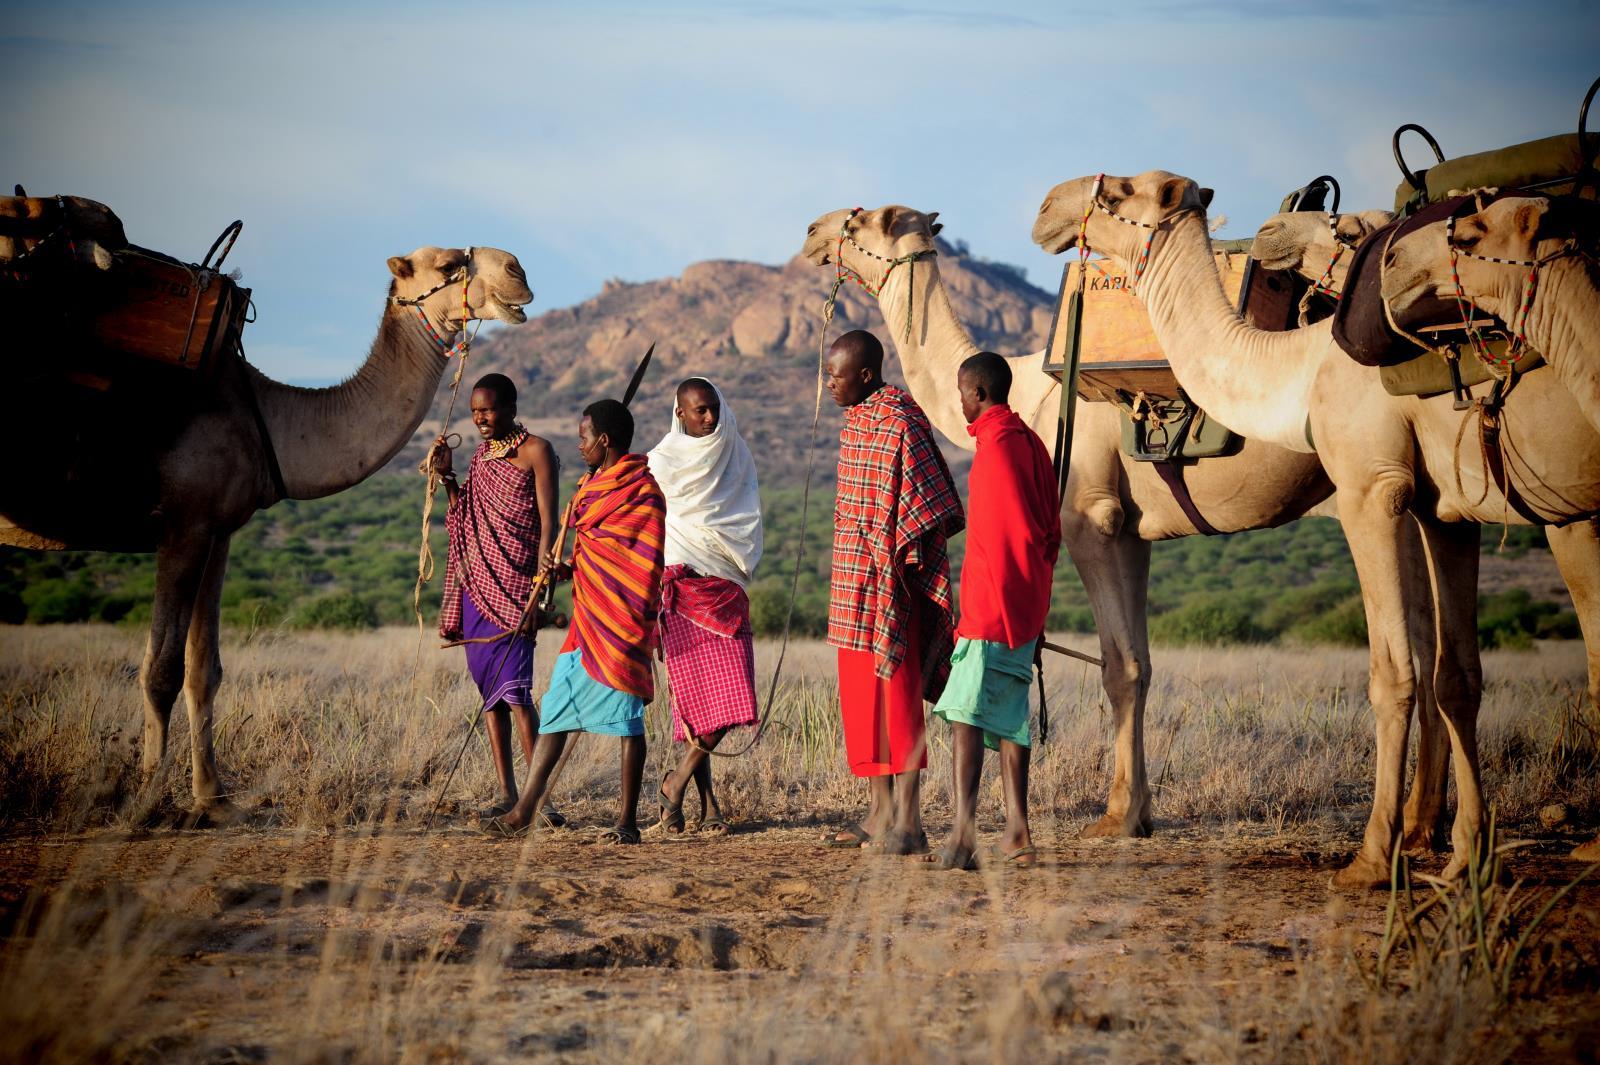 Camel Safari through Laikipia, Kenya with Masai and Samburu Guides